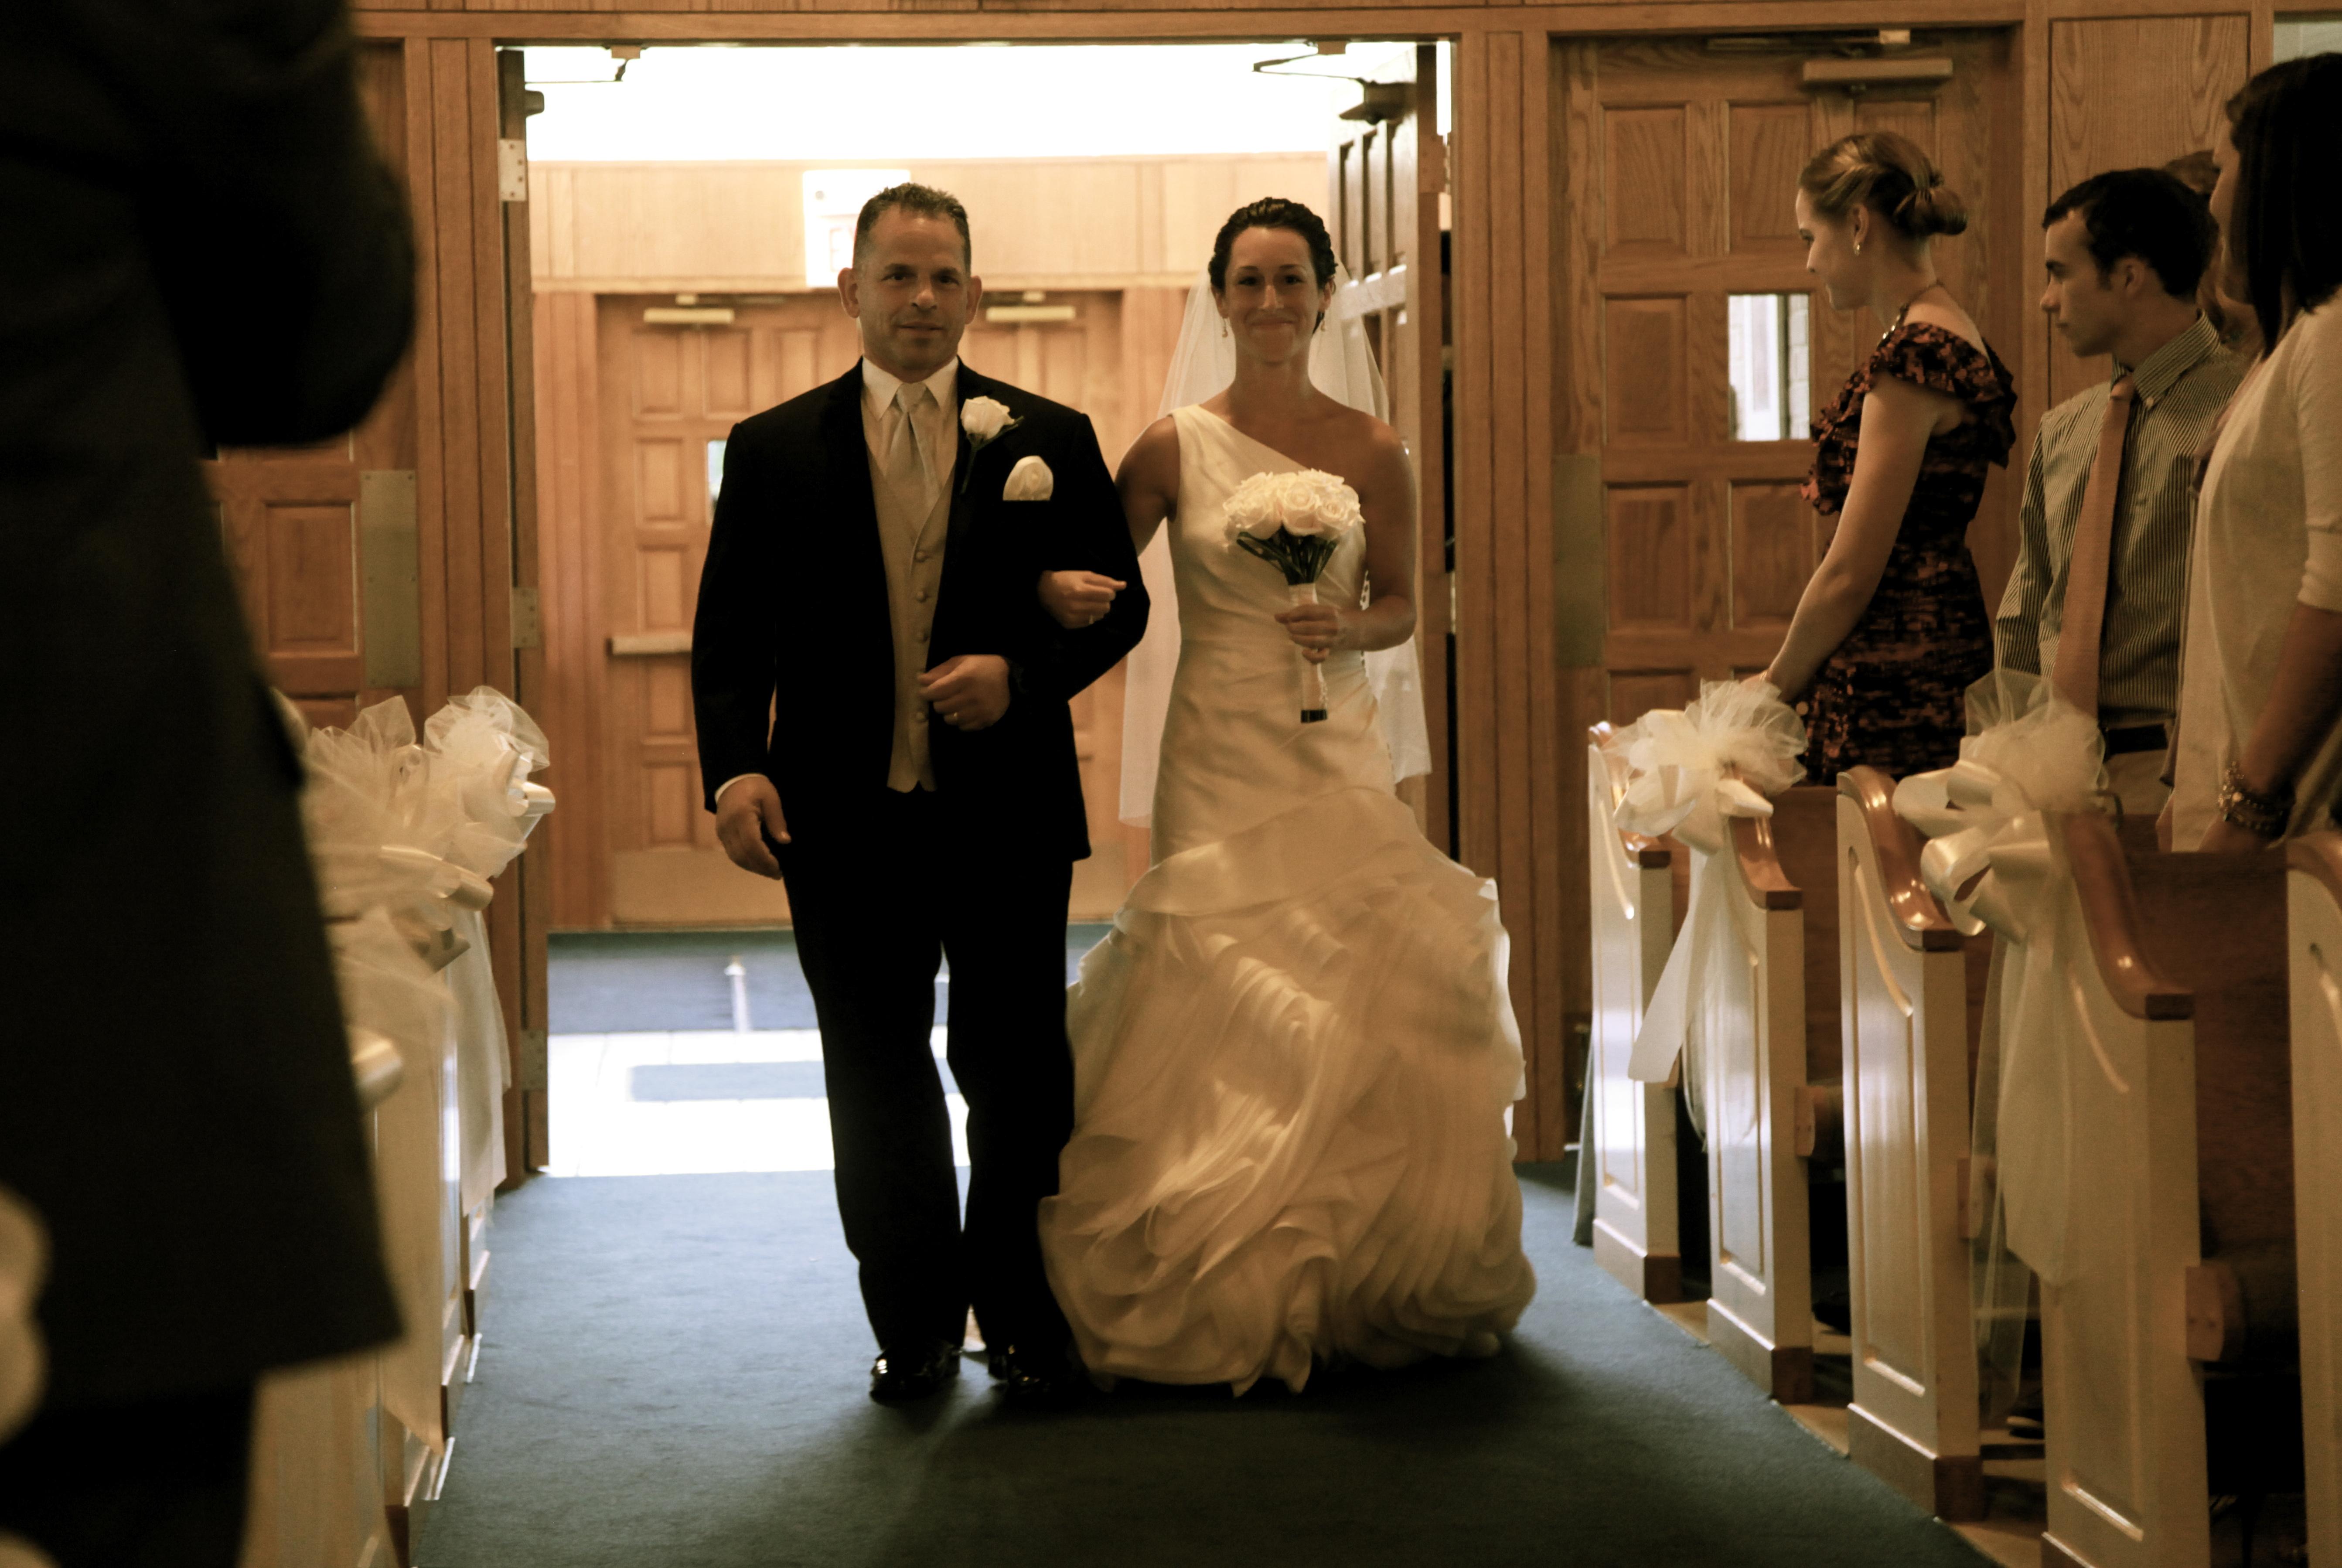 Father walks the Bride